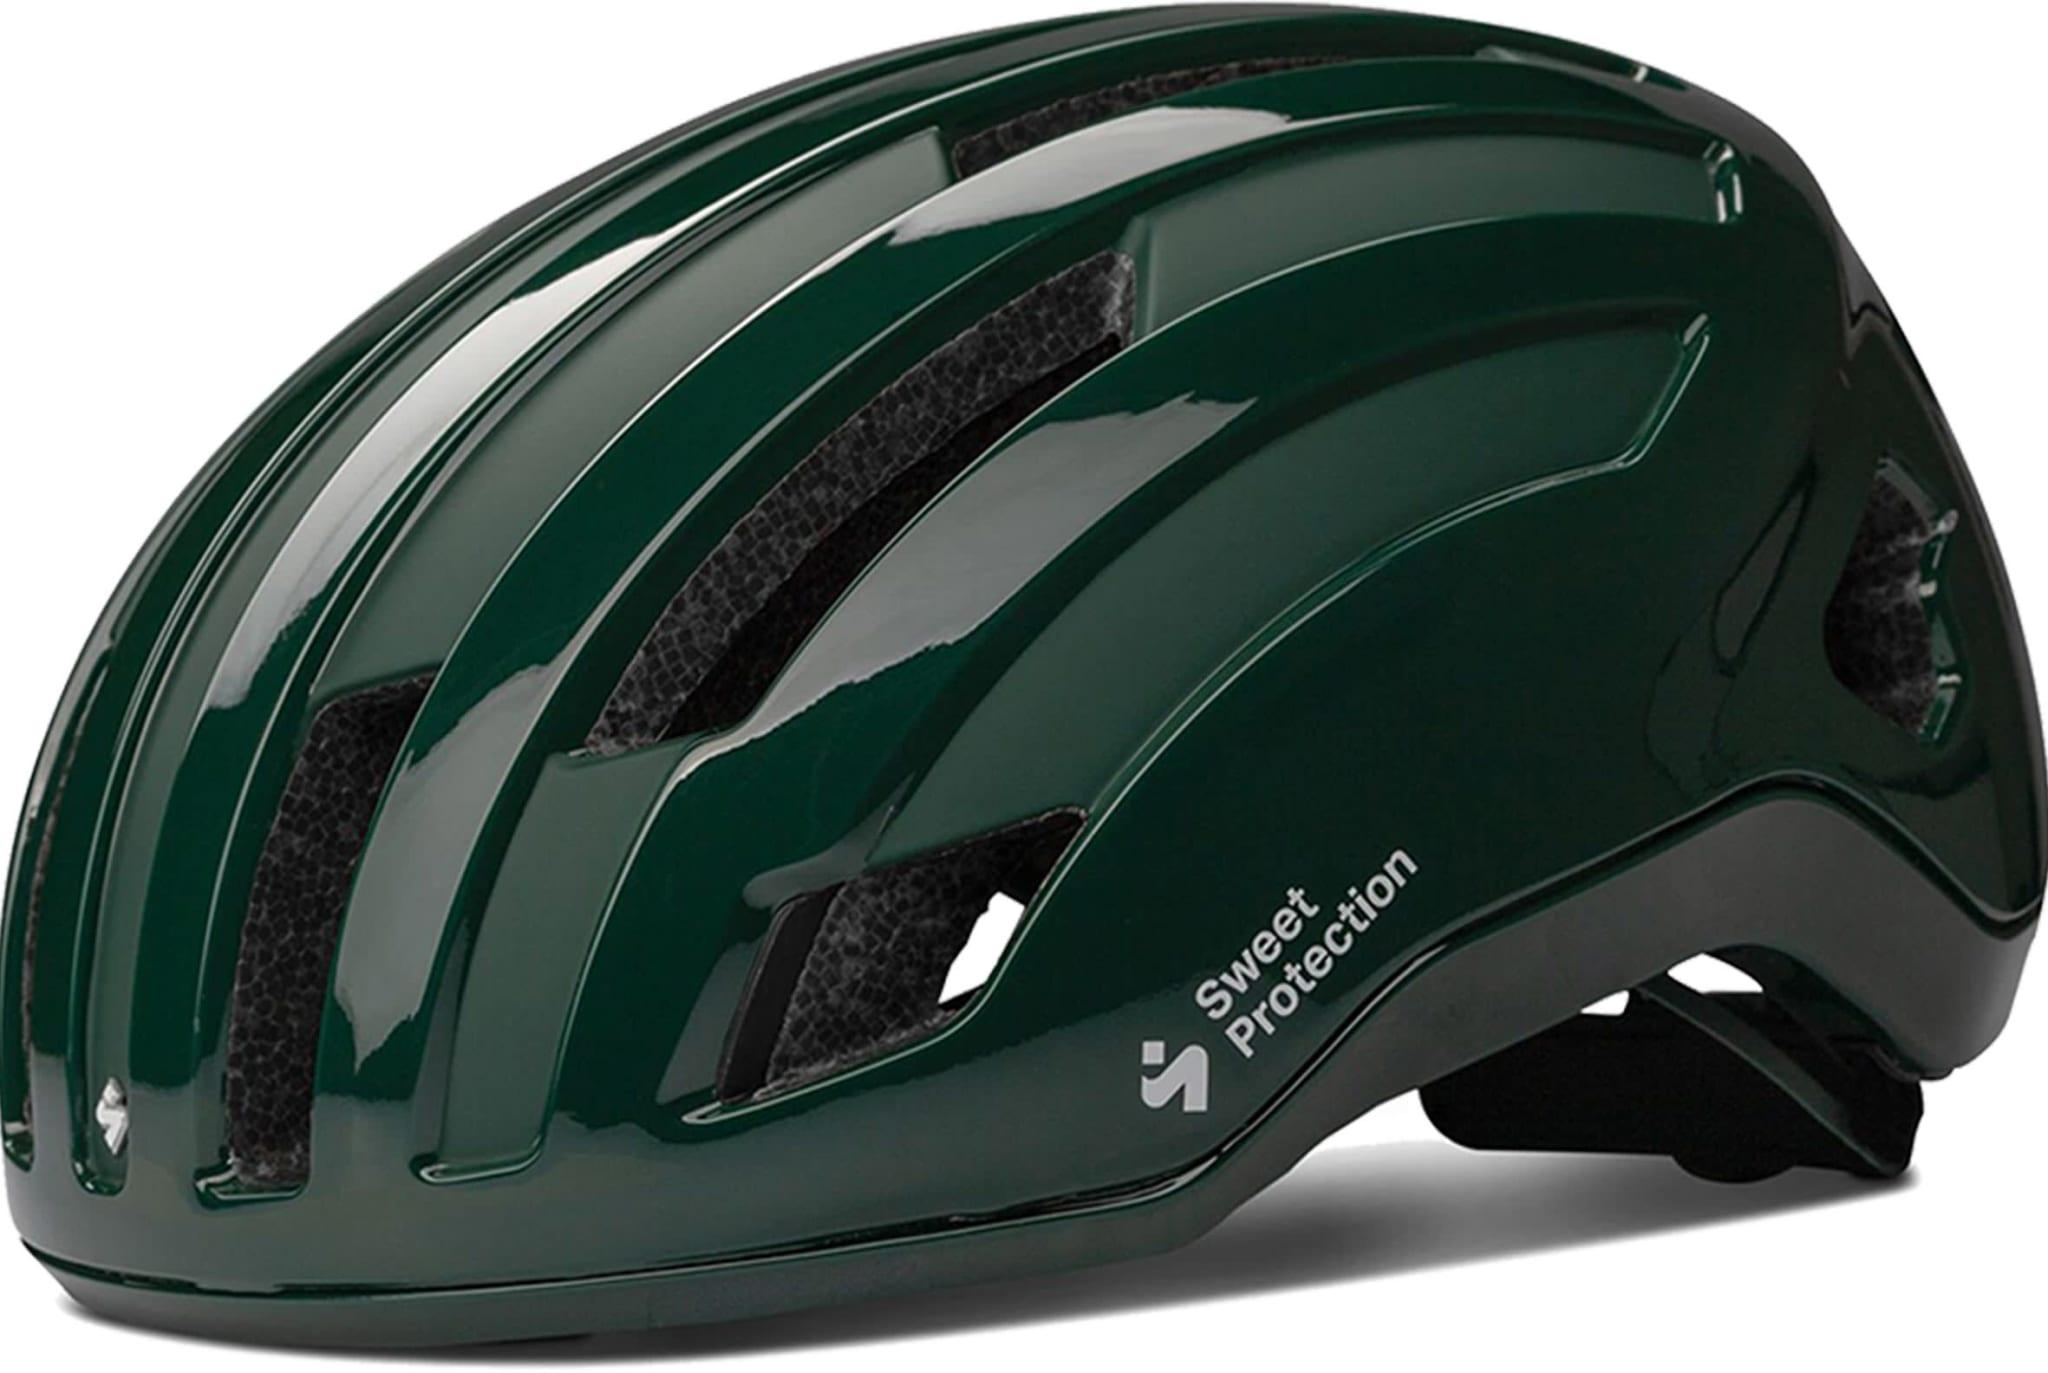 Outrider MIPS Helmet